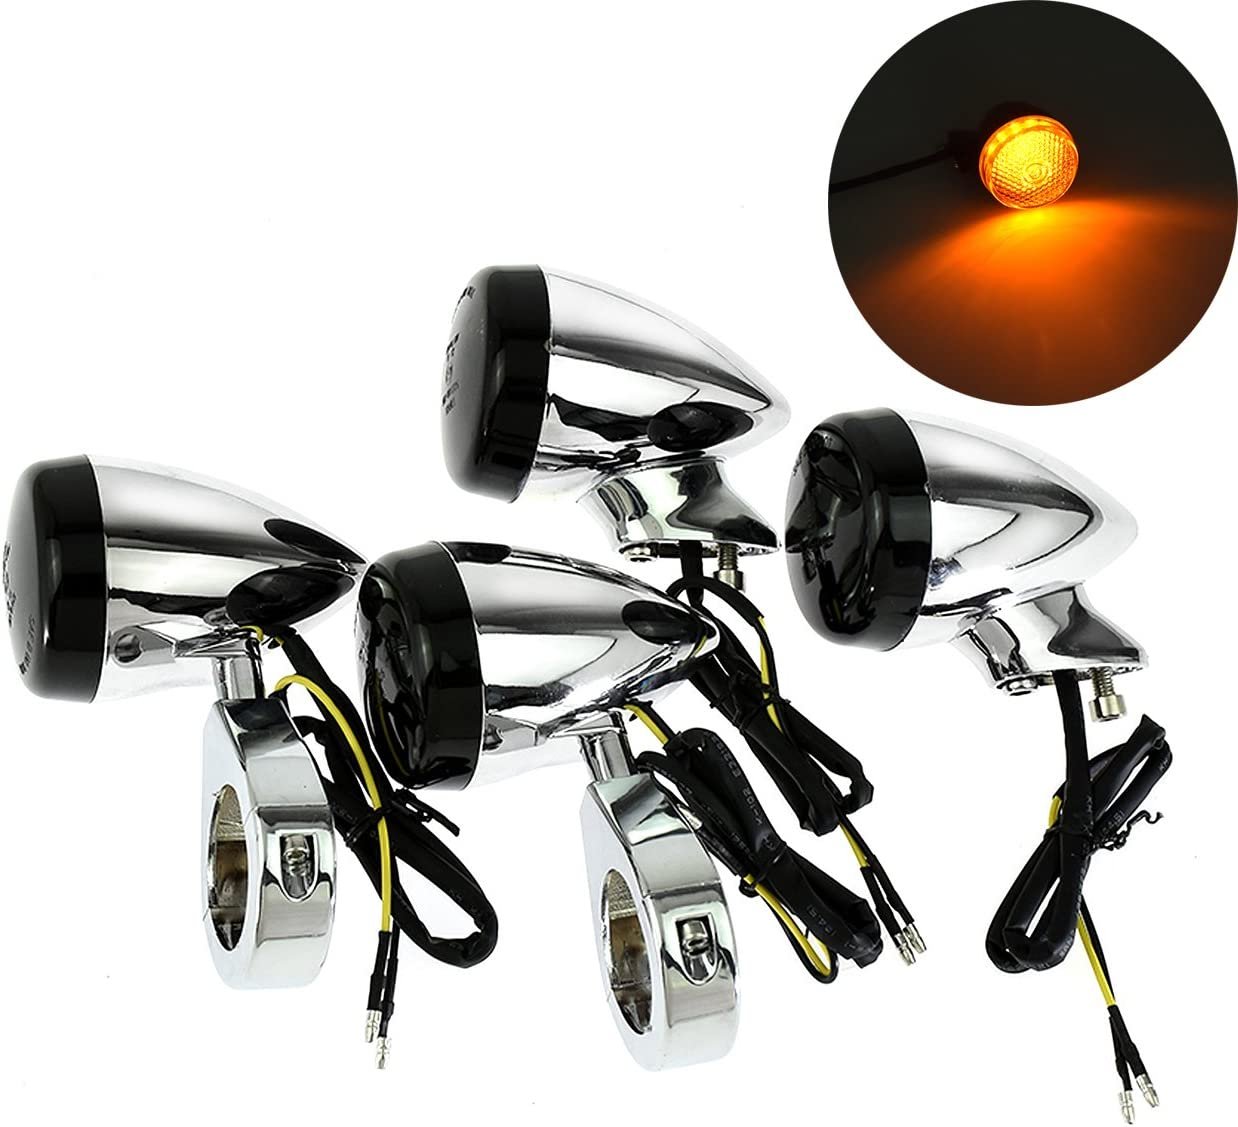 4Pcs Motorcycle Front Rear LED Turn Signal Indicator Light w//41mm Fork Clamp for Harley Sportster Dyna Bobber Black+White